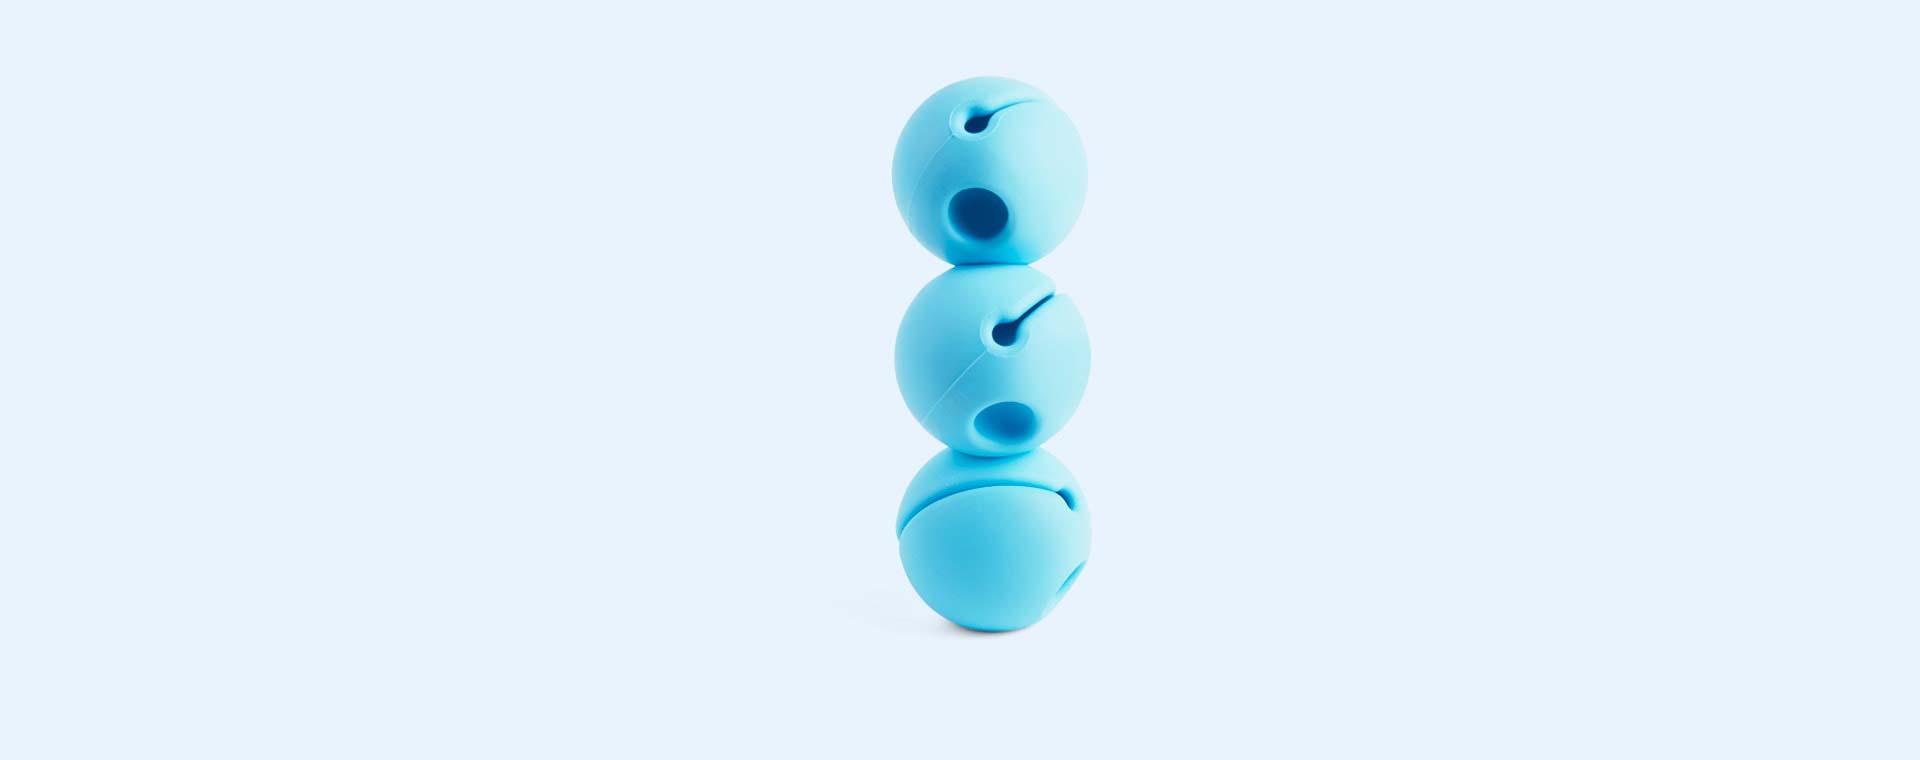 Blue Moluk Mox Balls 3 Pack